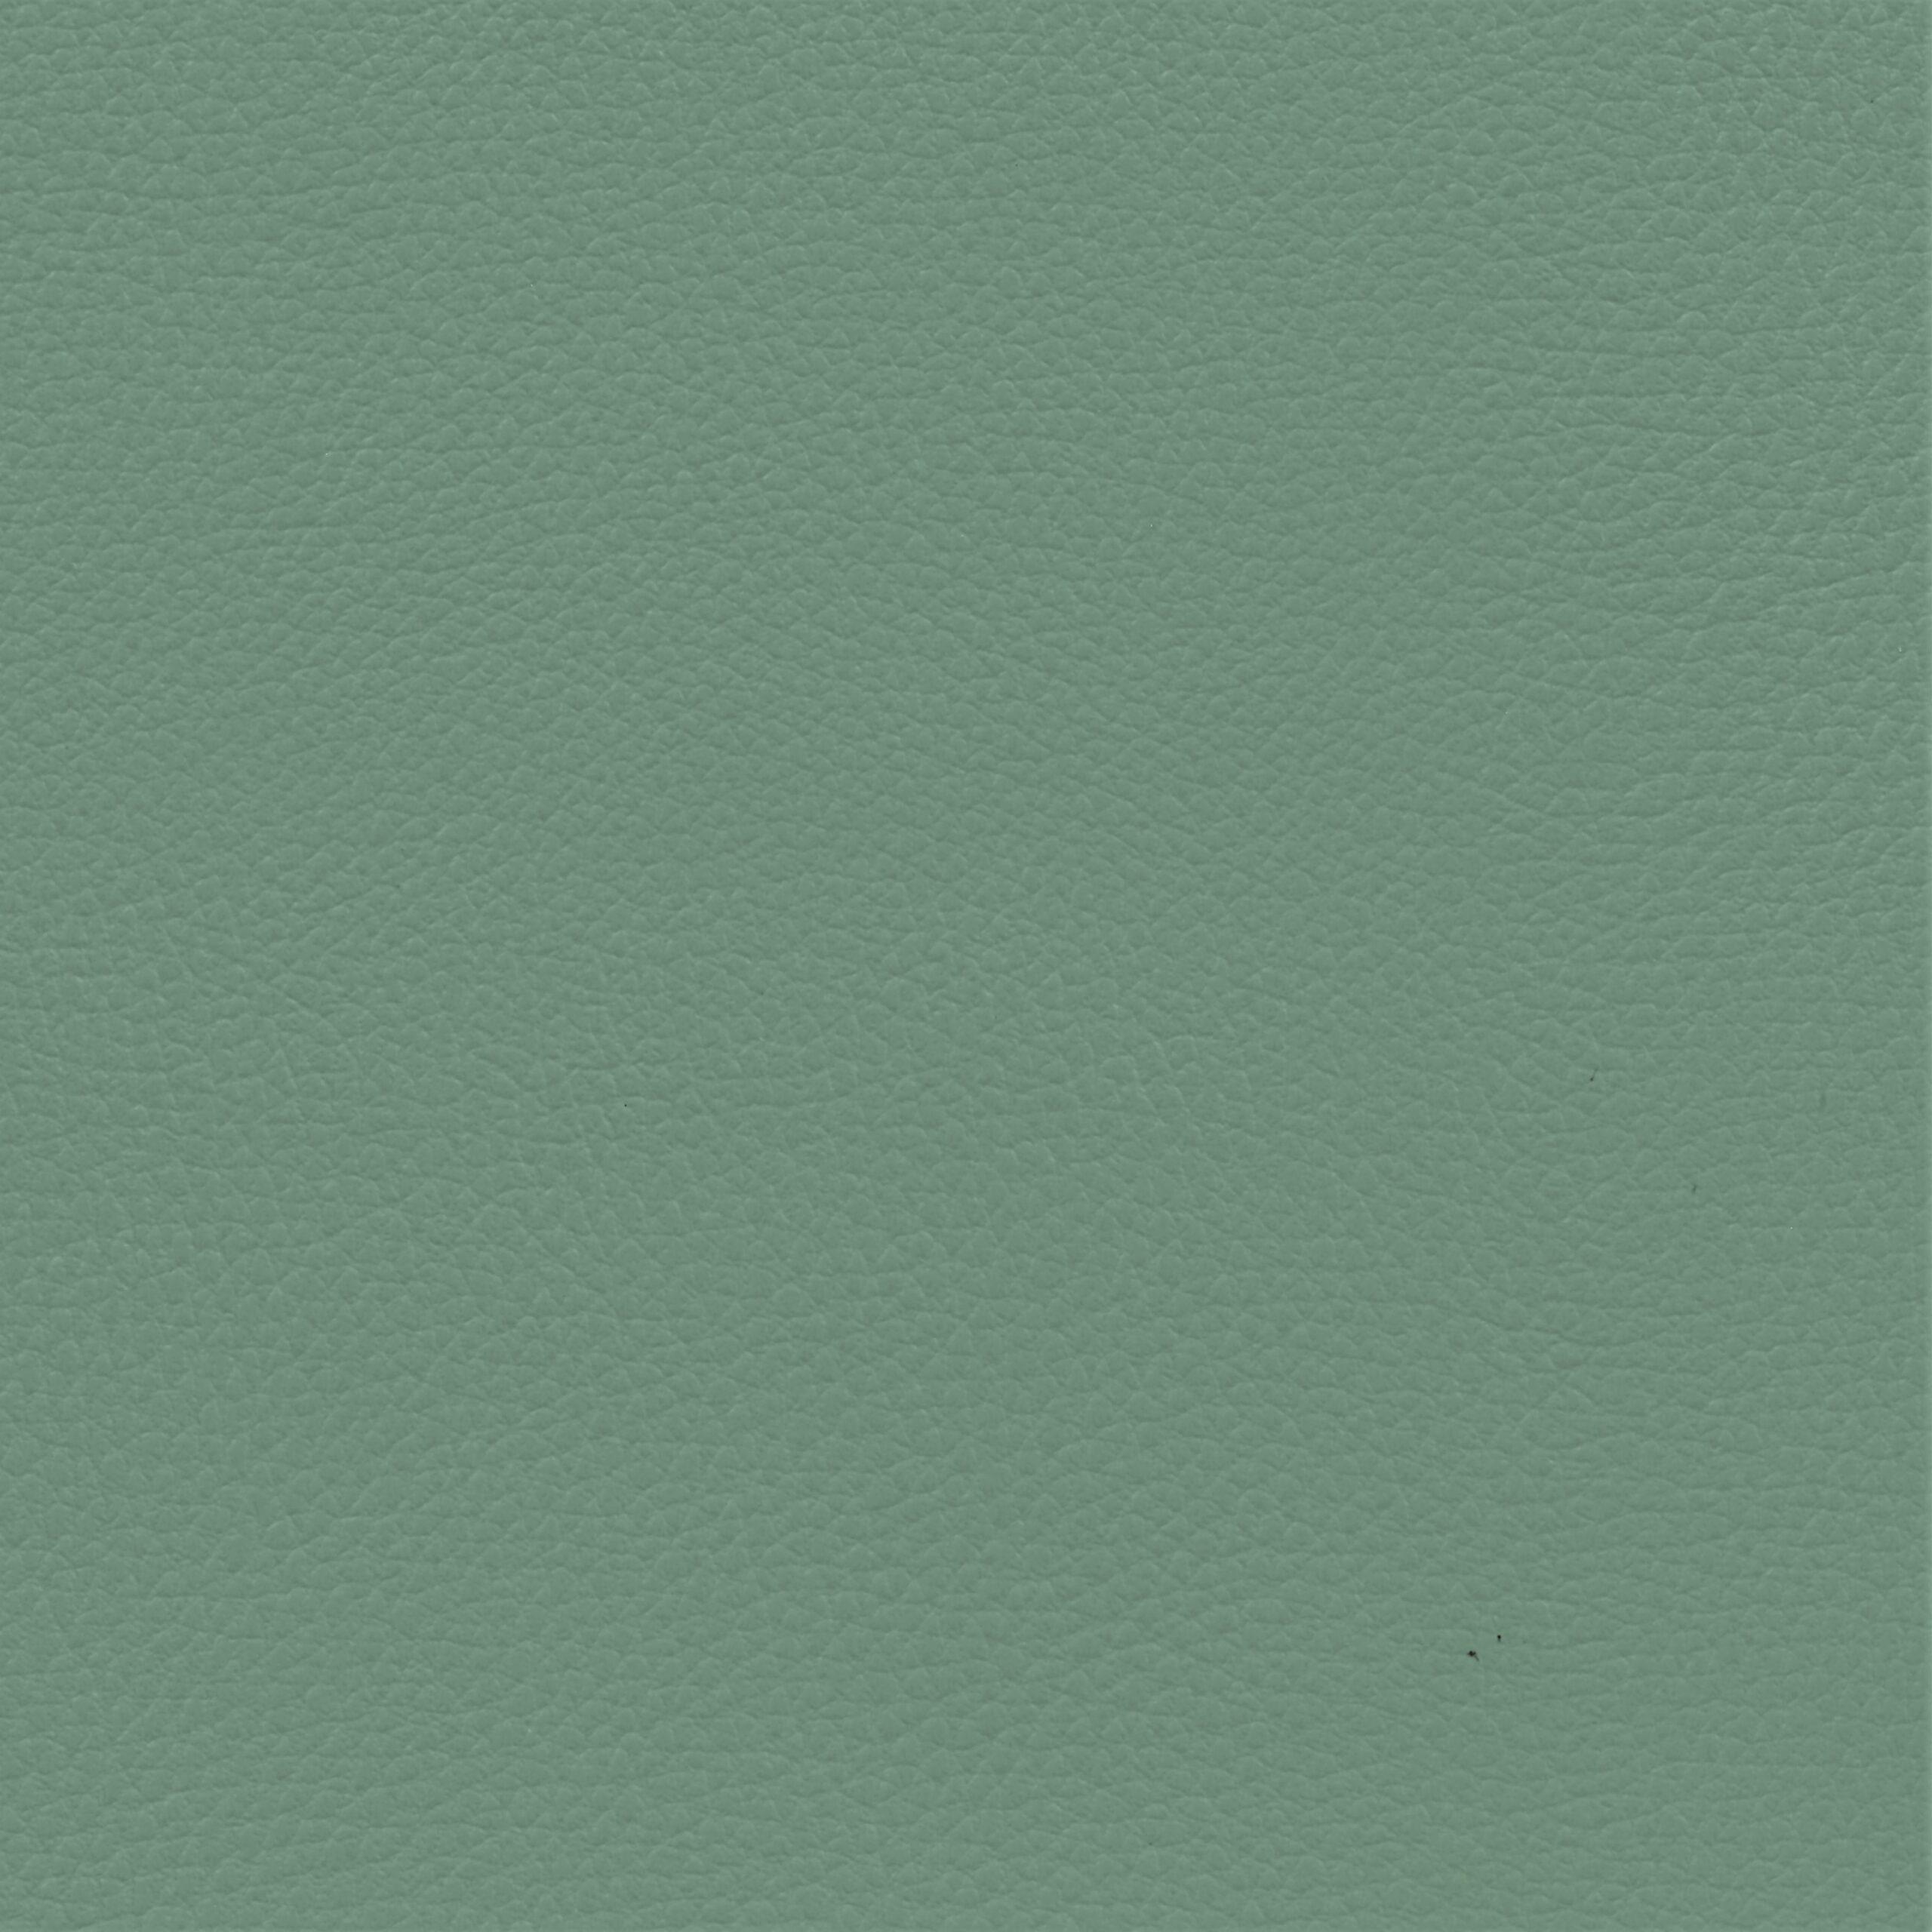 Ginkgo Celadon - Cotting / calme sophistique